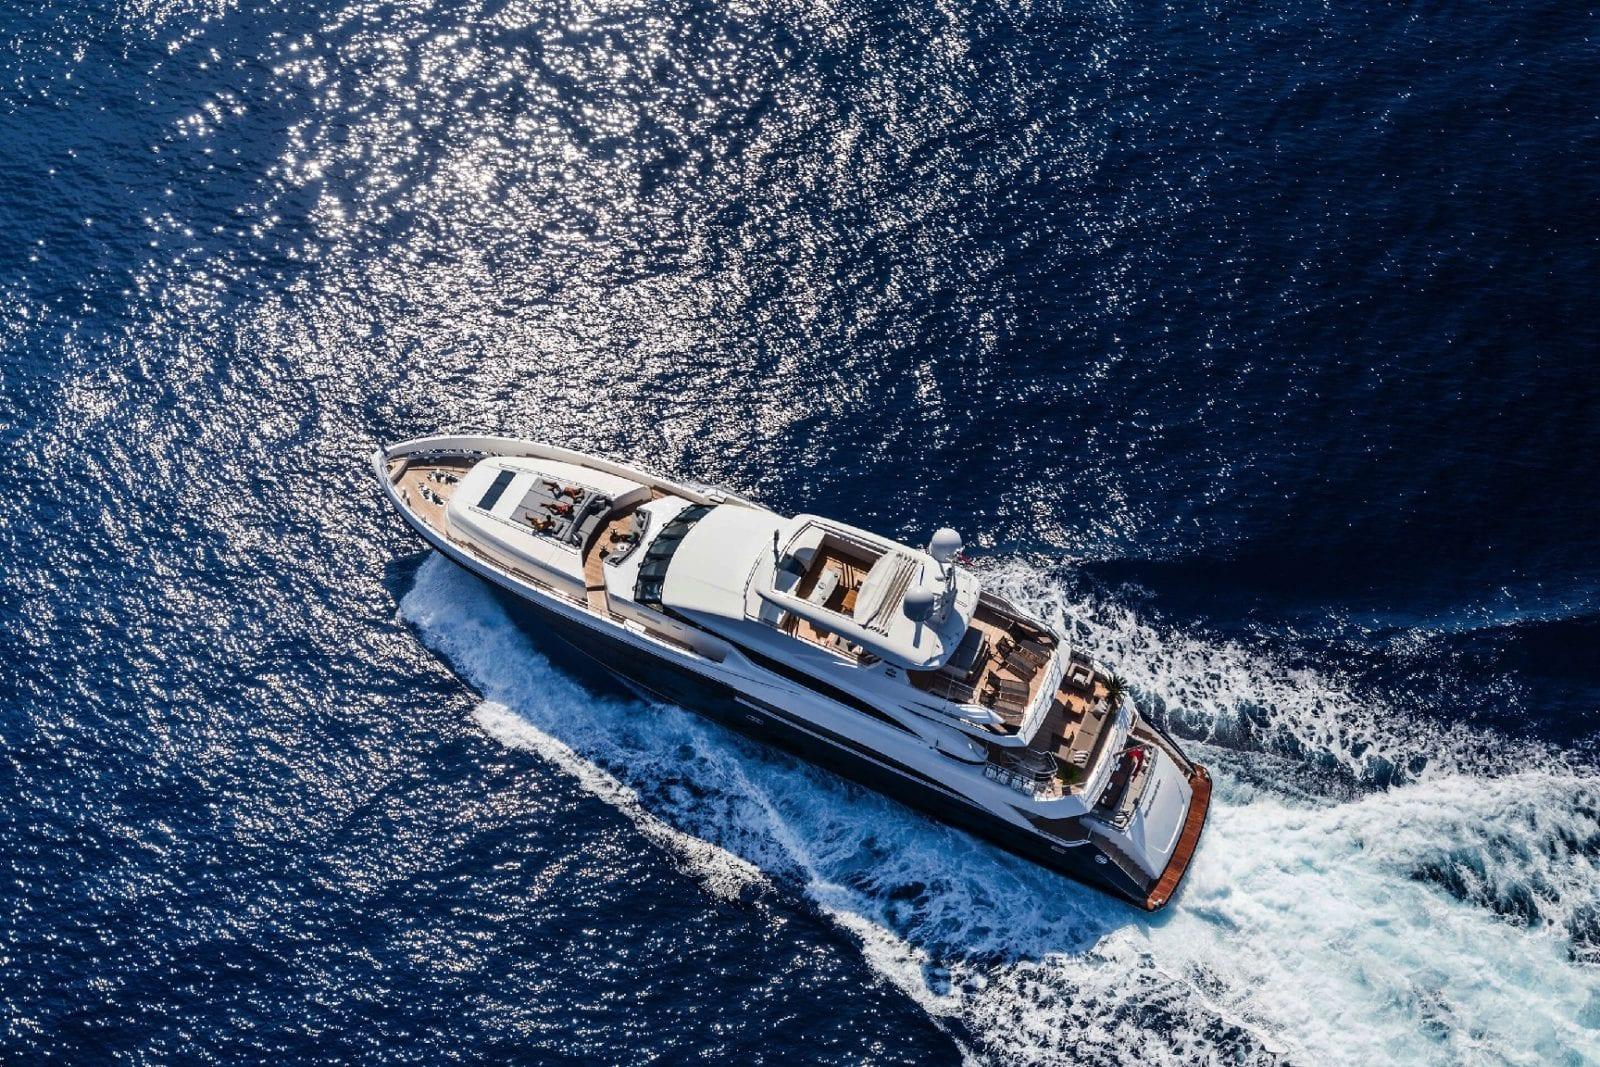 Шикарная чартерная мега яхта Солярис от Princess 40 M